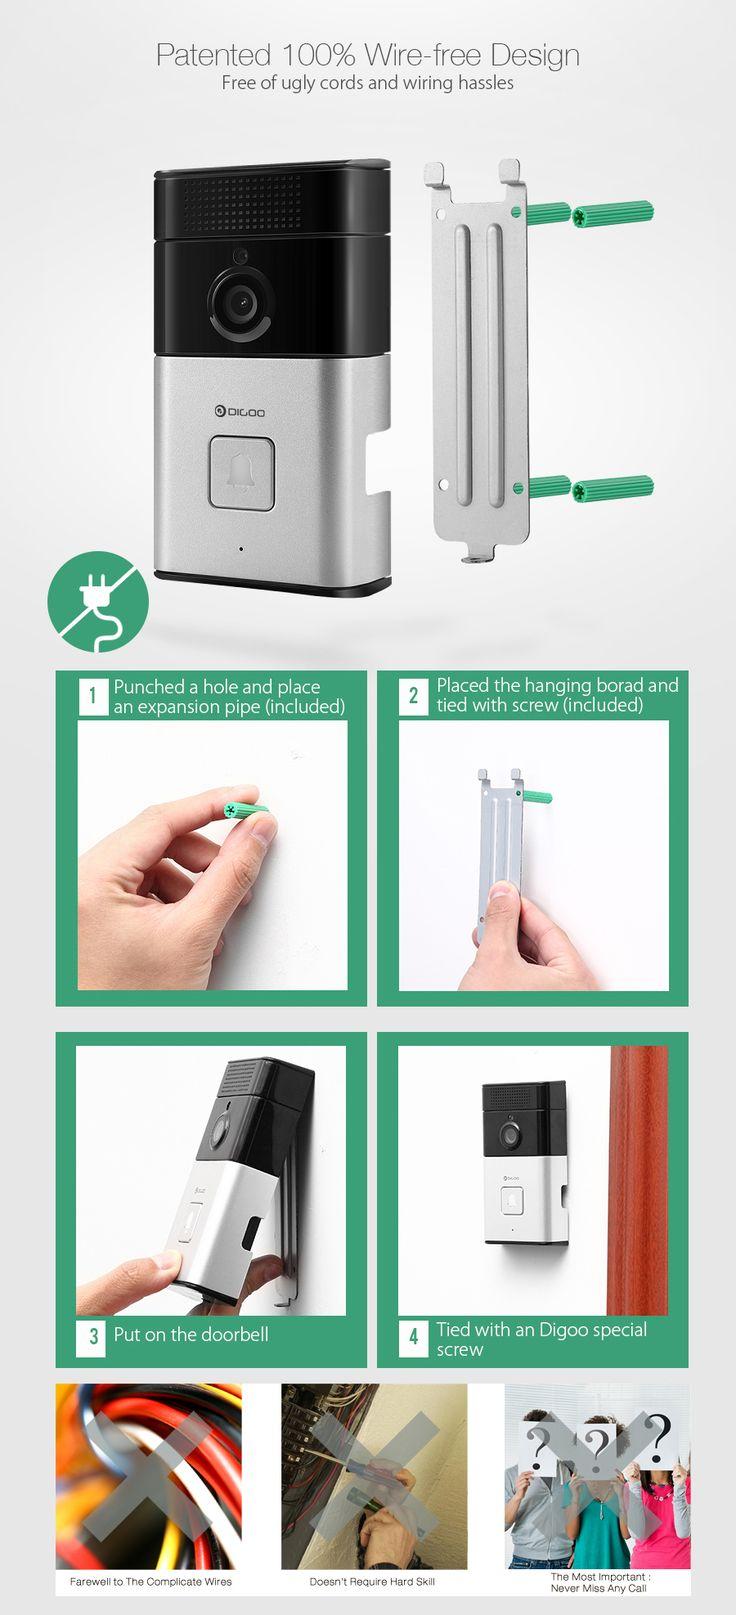 BluetoothのSBのXYZ digooカメラとWi-FiスマートハウスCHASD RINGERタッチフォン